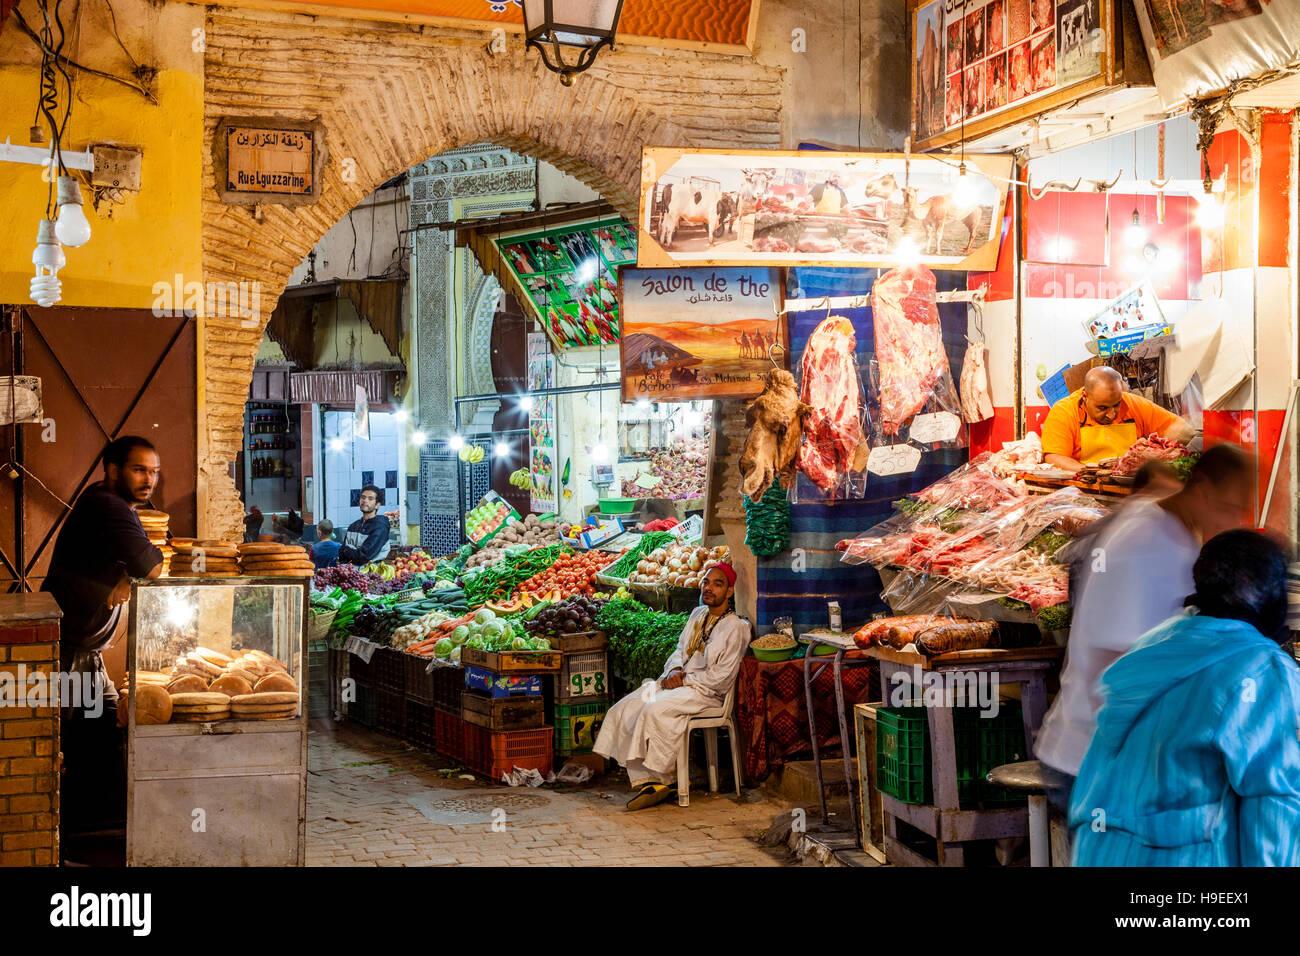 food shops in the medina fez el bali fez morocco